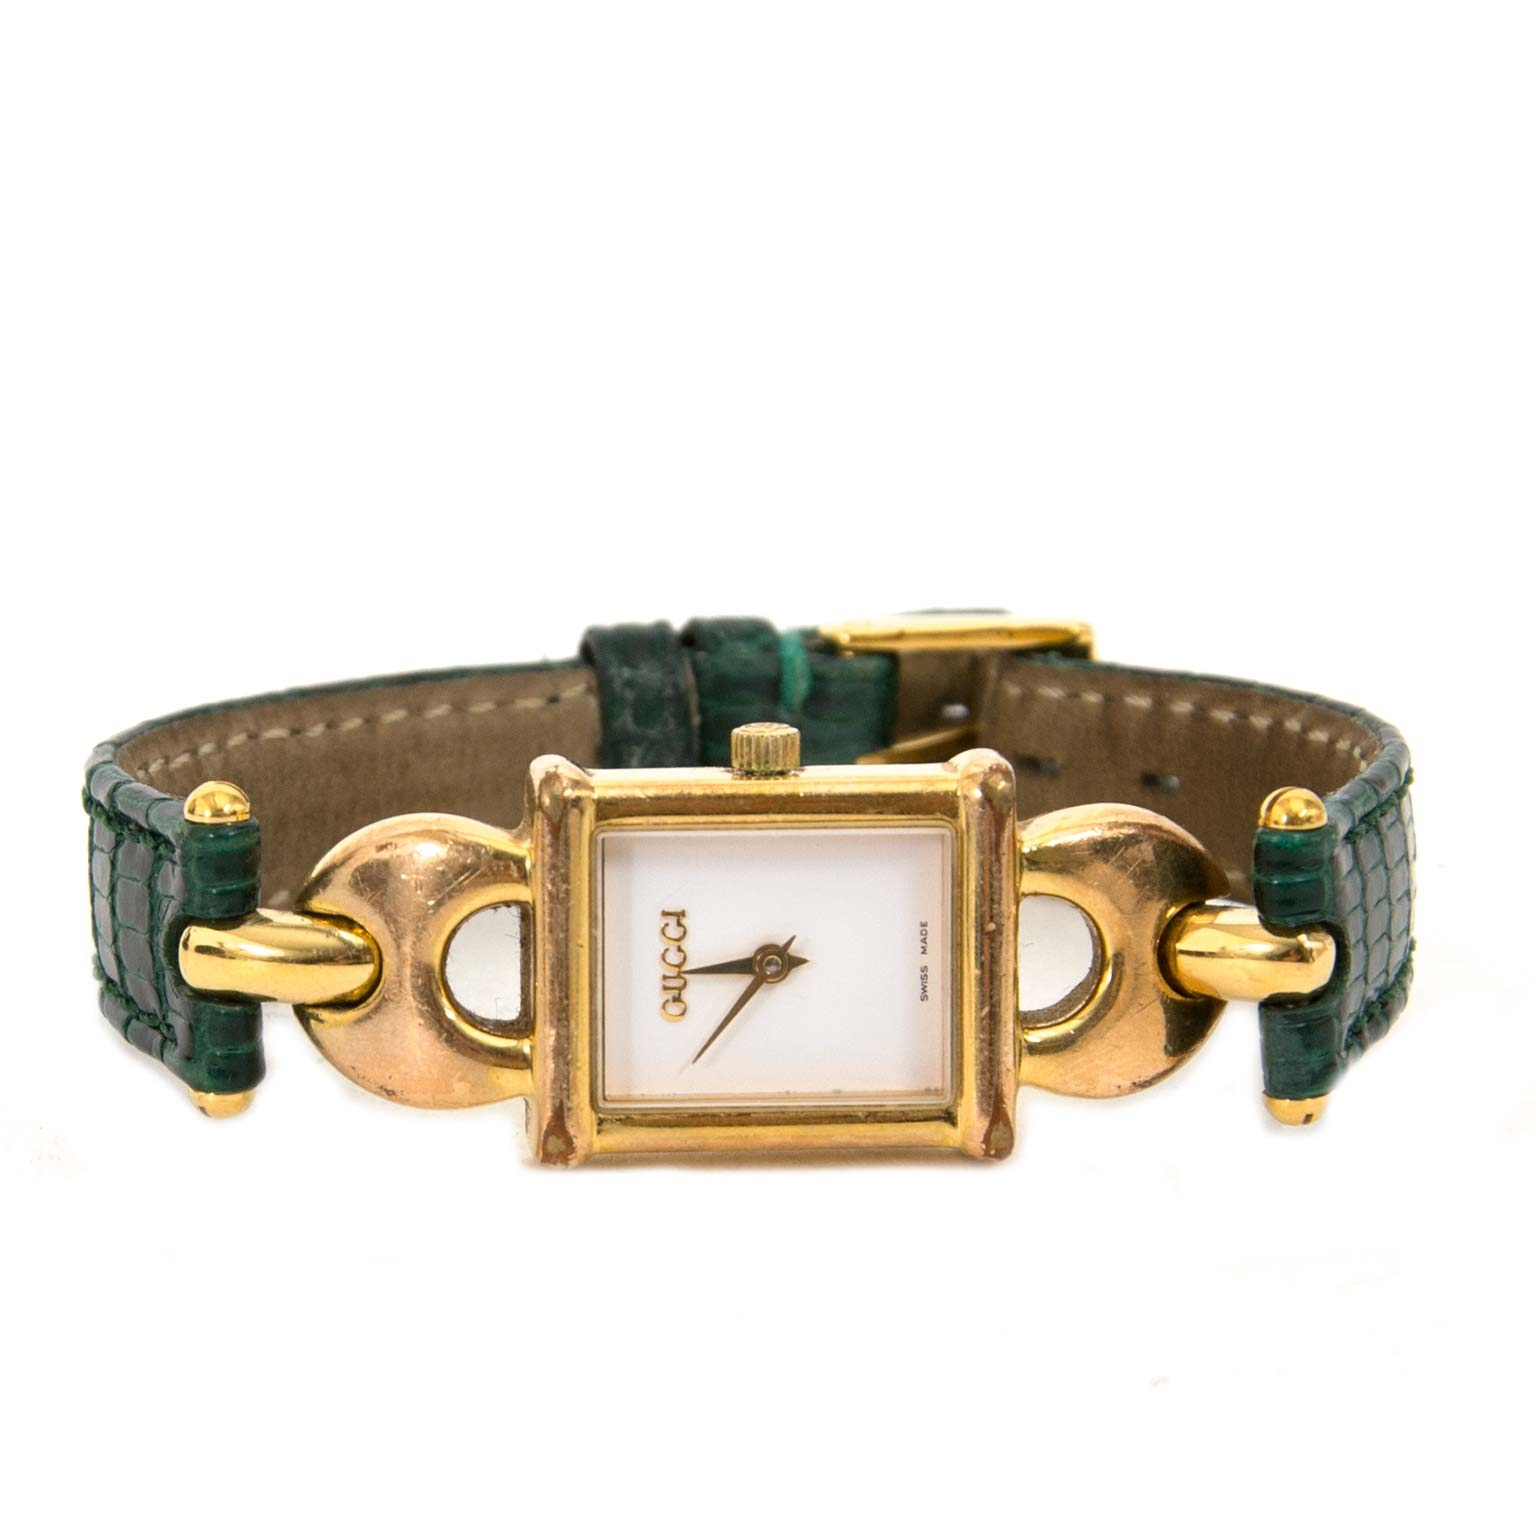 Buy safe online authentic Gucci 1800L Timepiece Watch at labellov antwerp vintage webshop